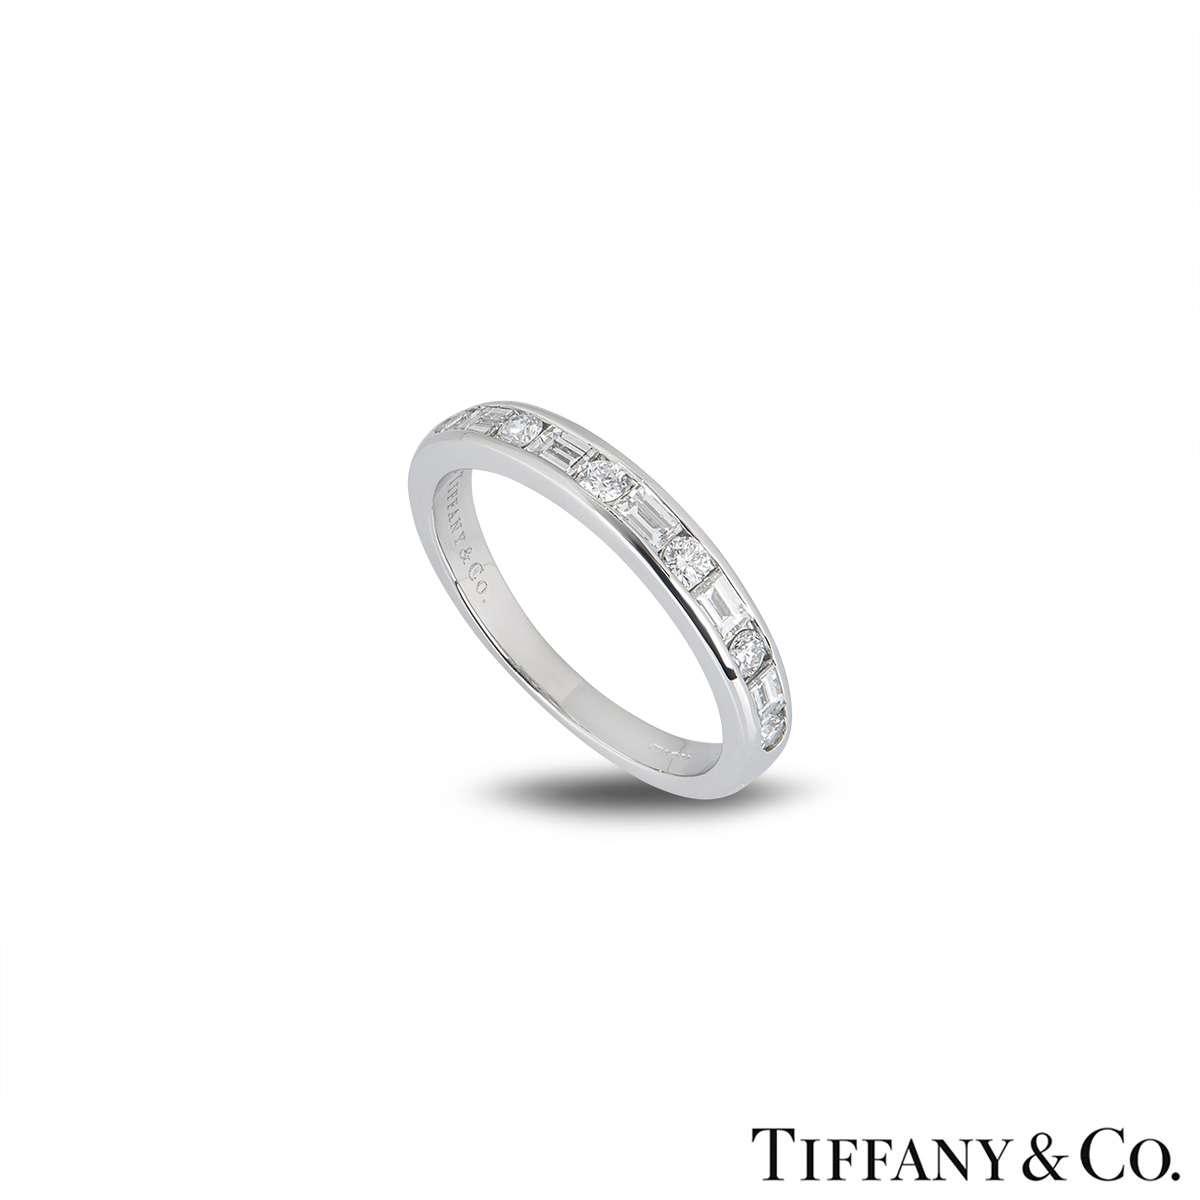 Tiffany & Co. Platinum Diamond Channel Set Band Ring